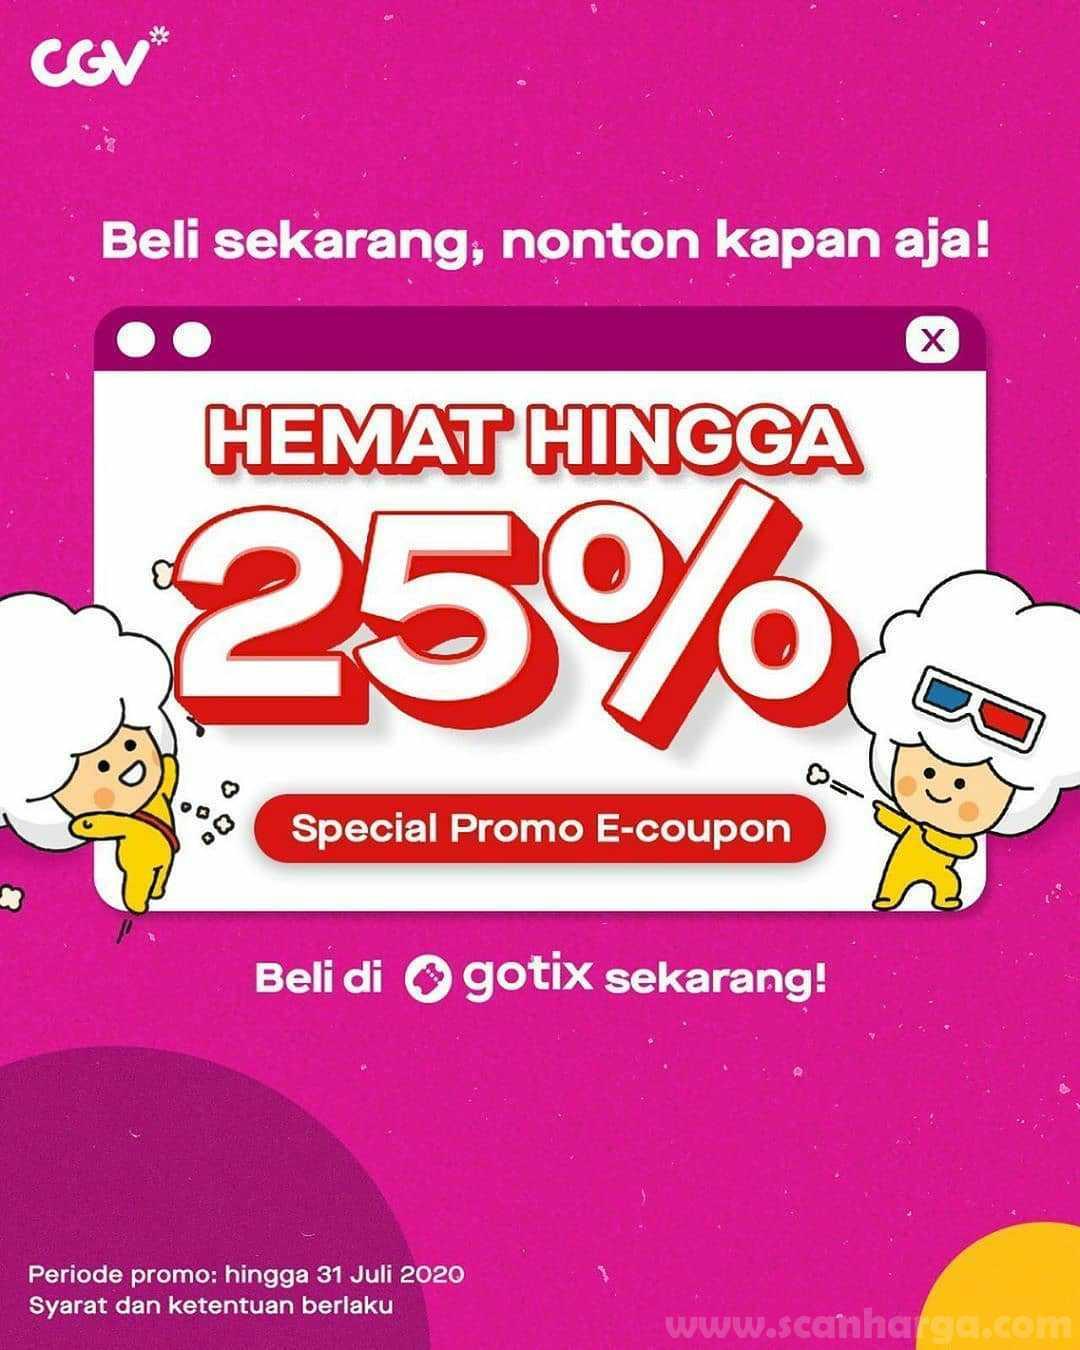 Promo CGV Cinemas Nonton Hemat Hingga 25% Pake E-Coupon dari GoTix!